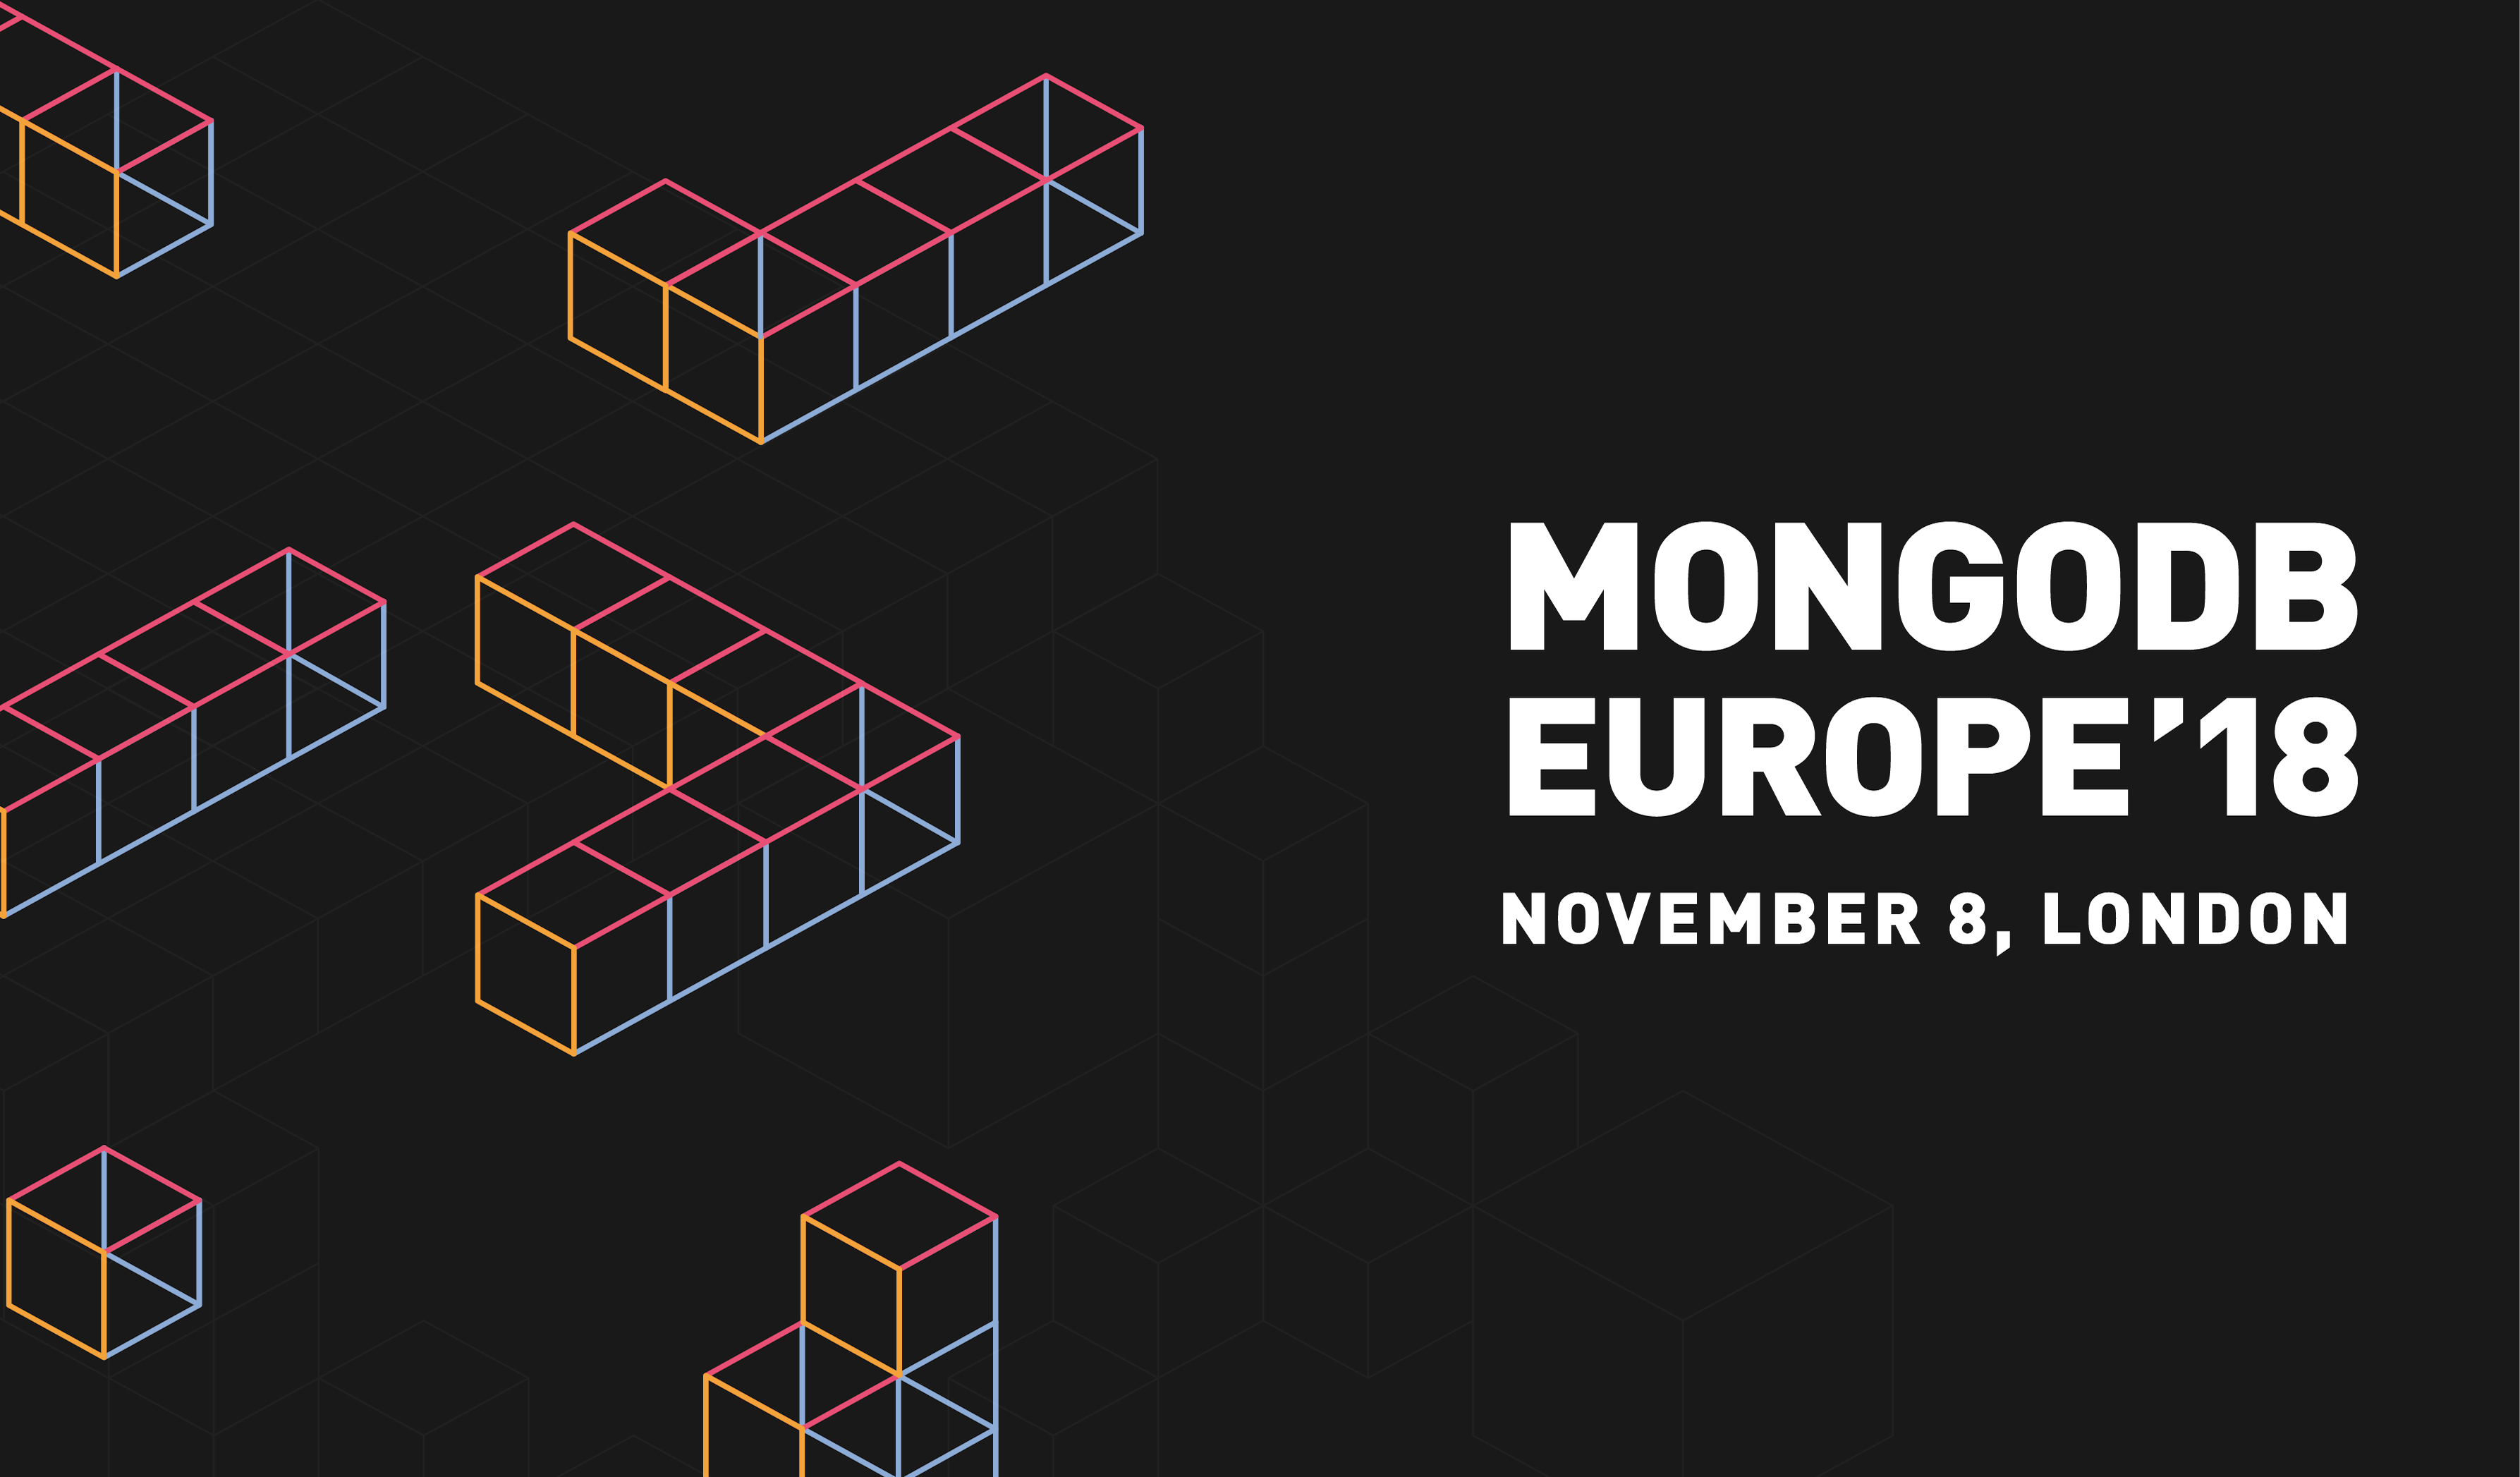 MongoDB Europe 2018 - Chris De Bruyne, Nick Van Hoof and Jan